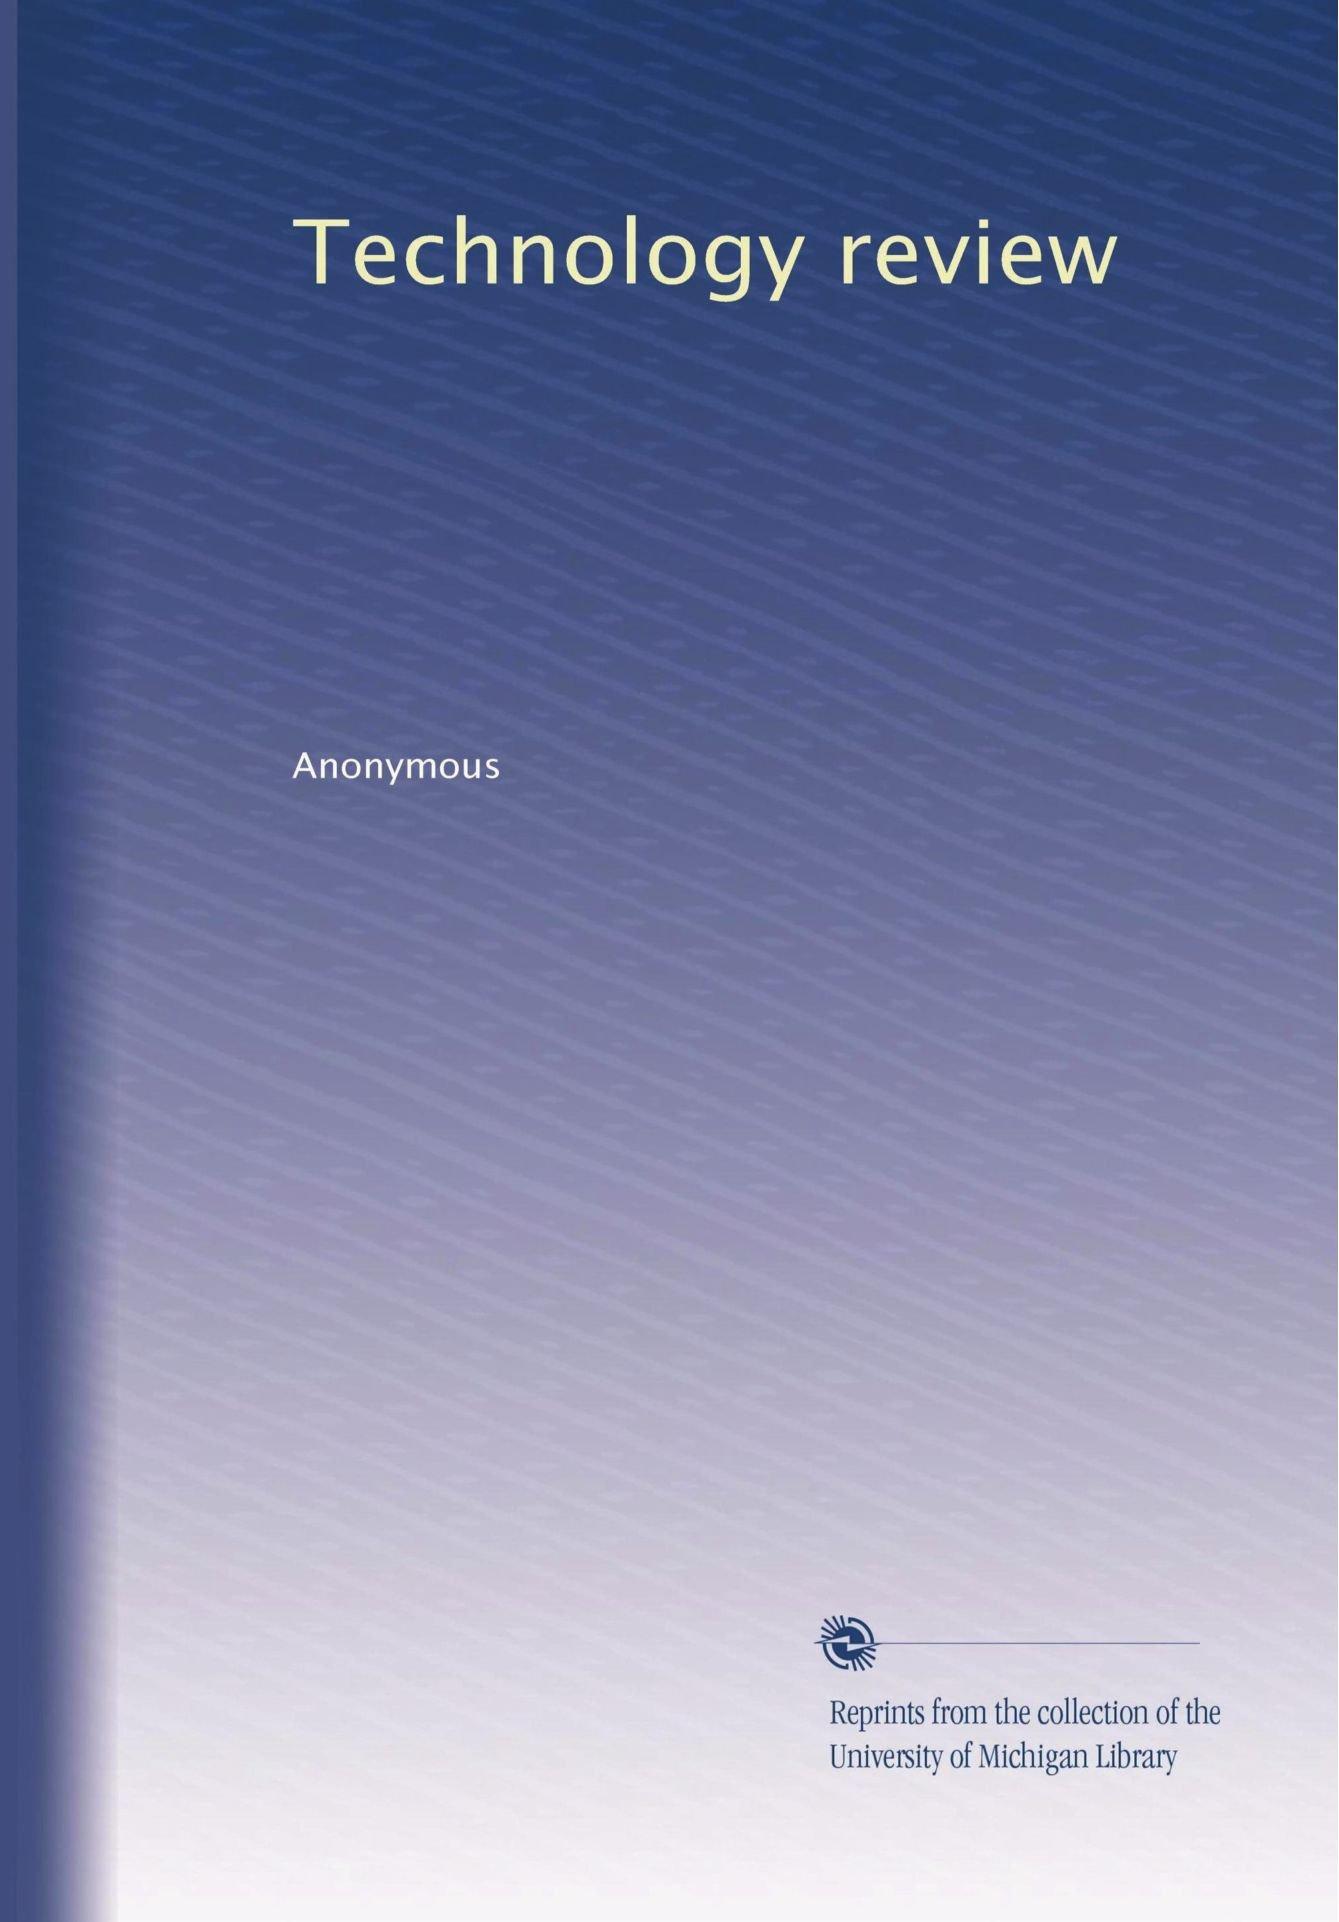 Technology review (Volume 7) pdf